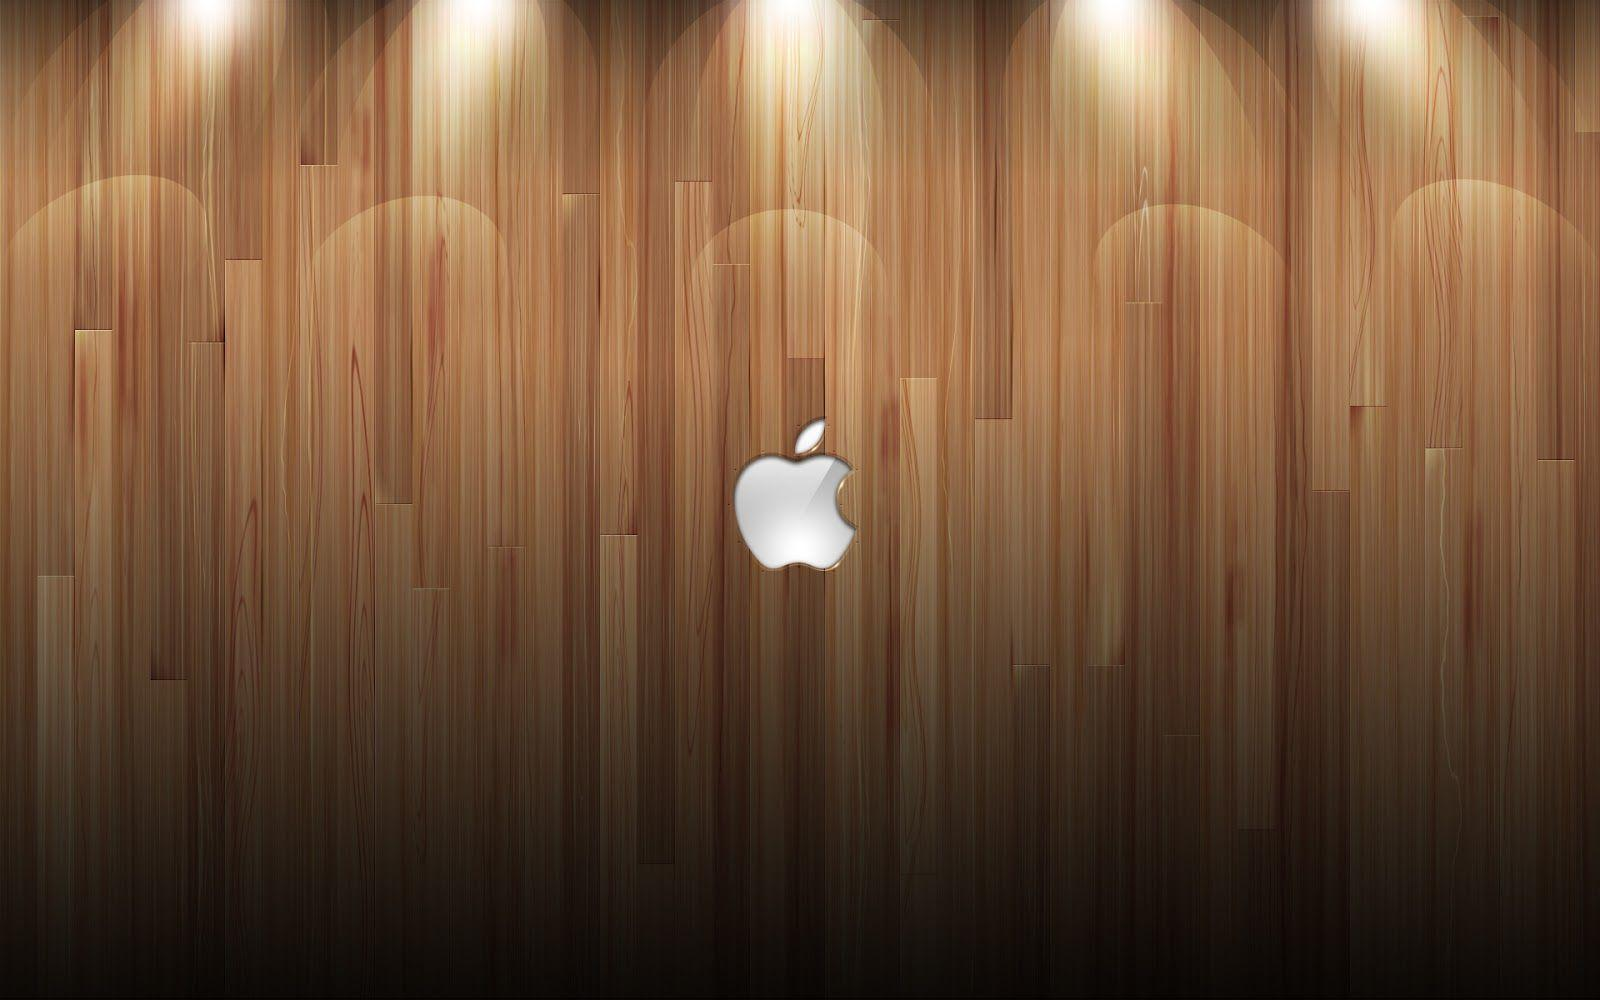 Hd wallpaper wood - Mac Background Wood Wallpaper Mac Background Wood Hd Wallpaper